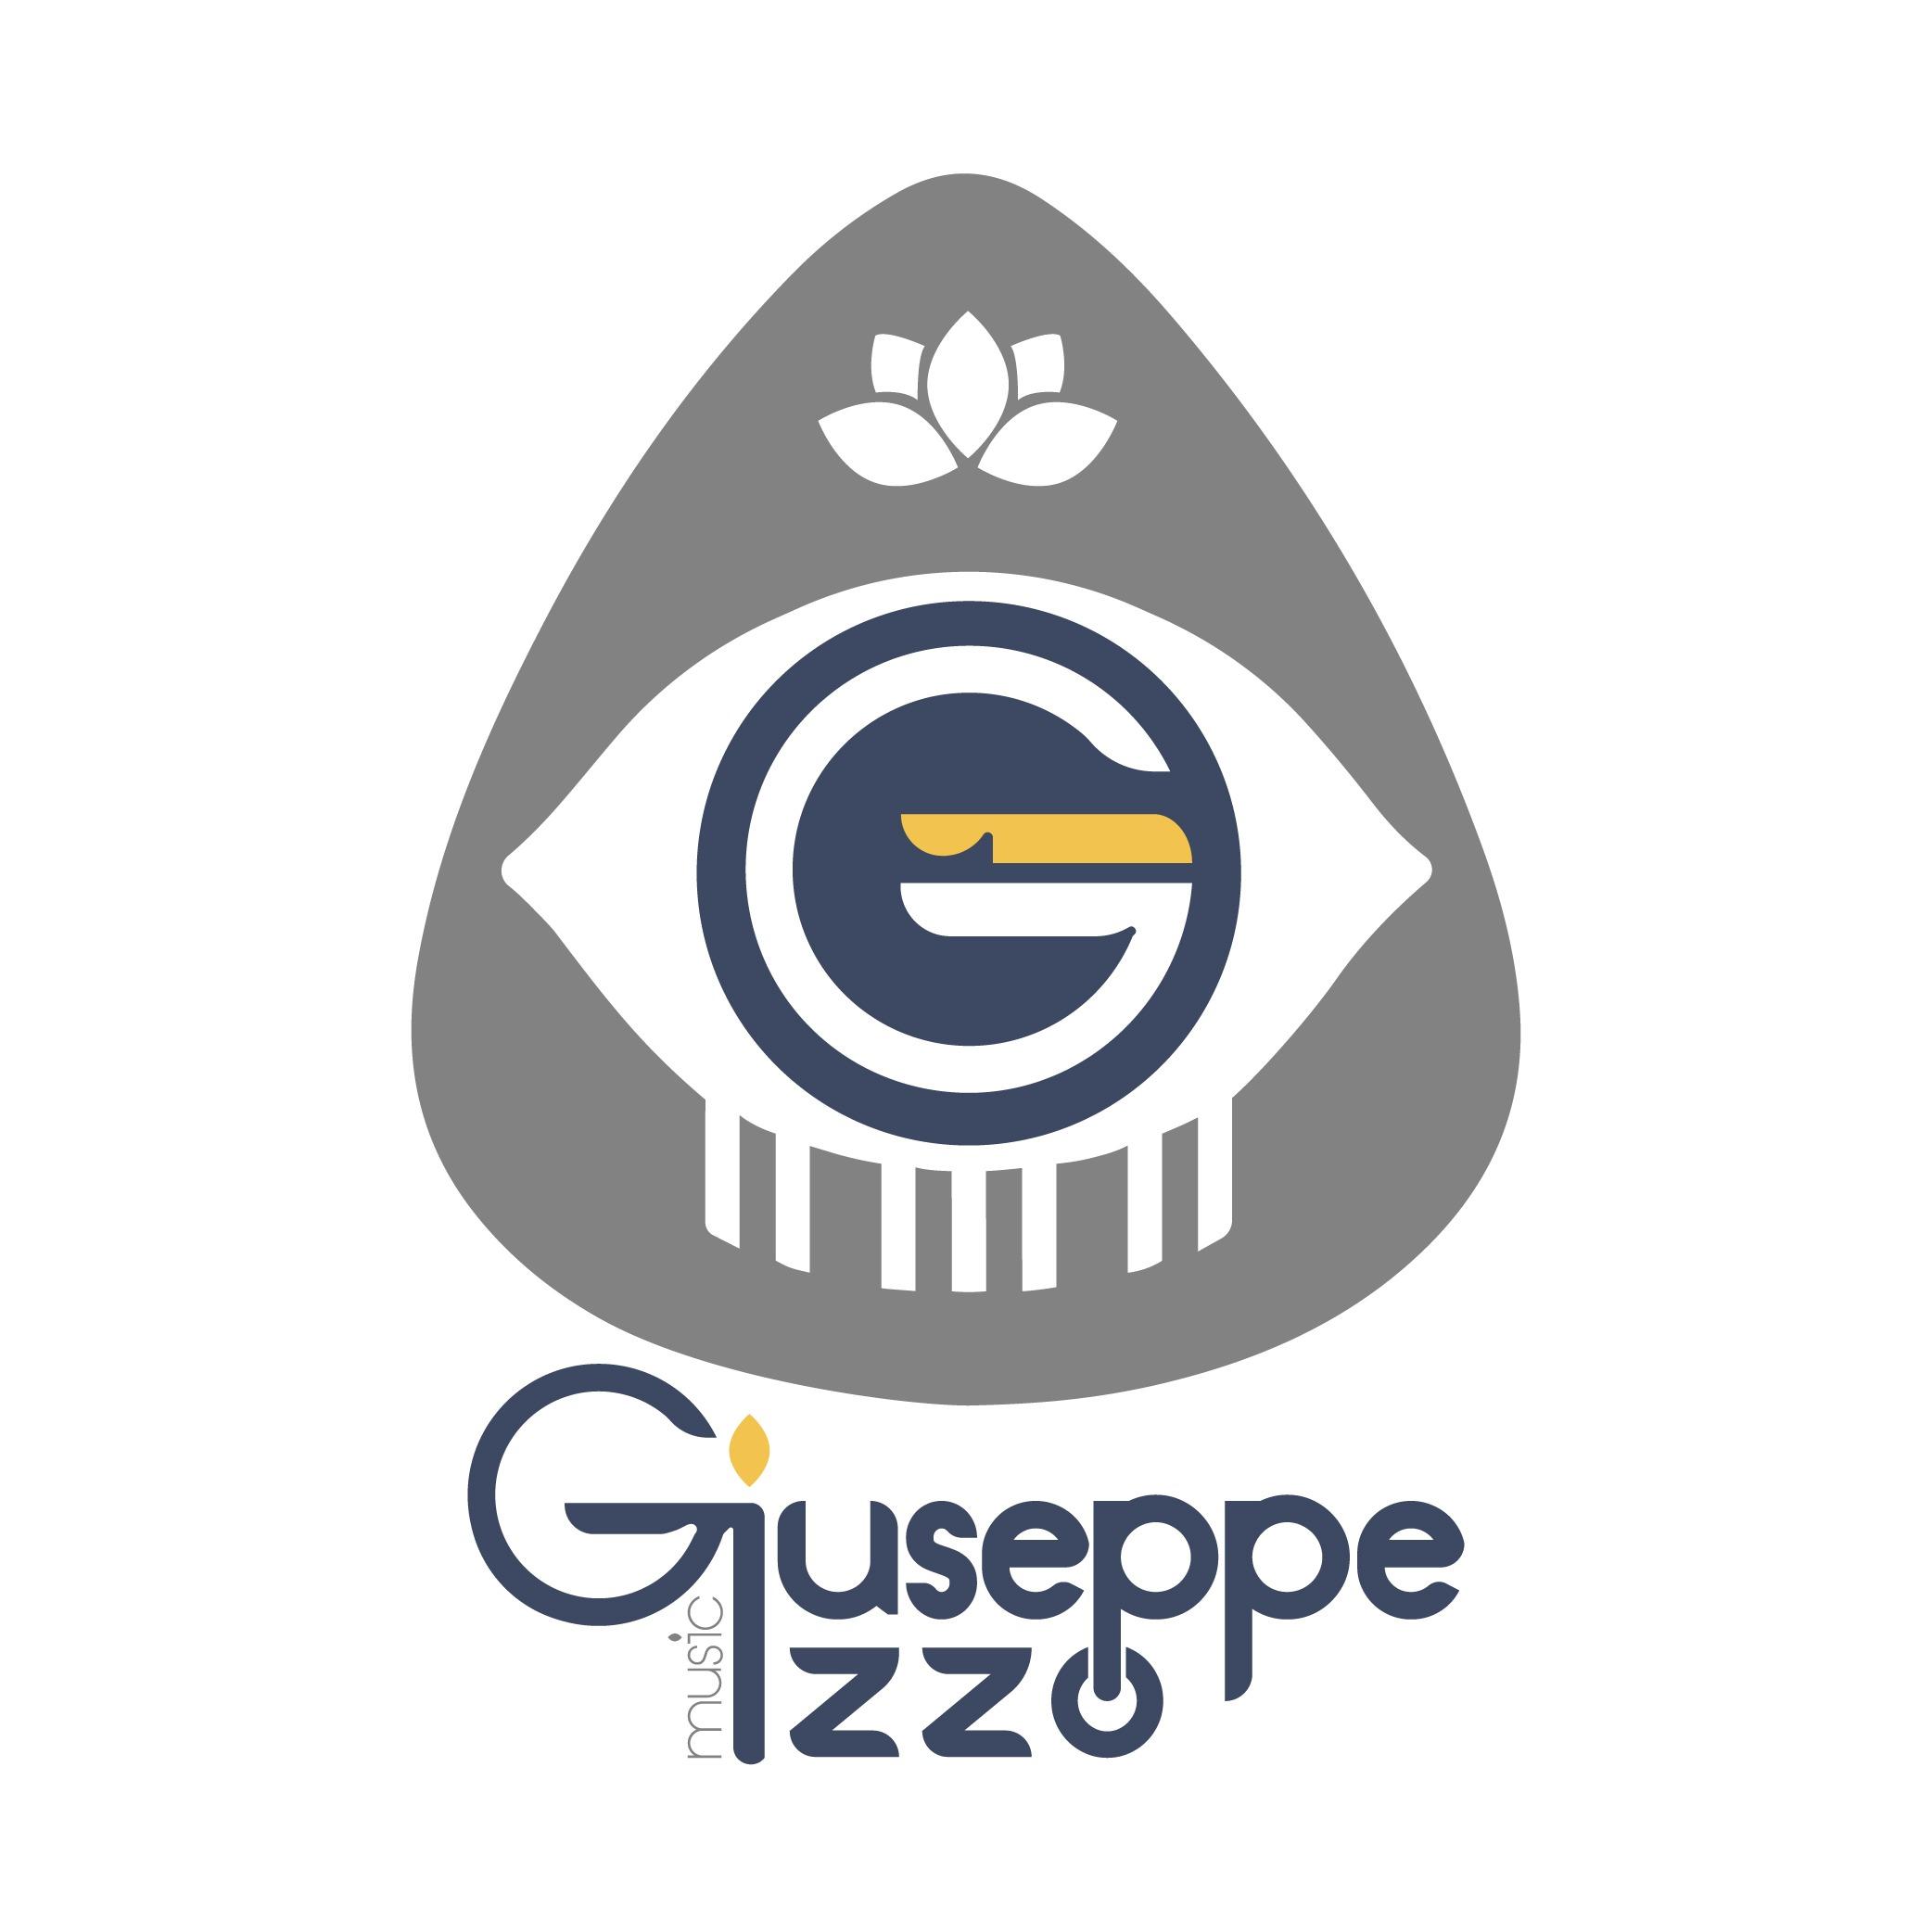 @giuseppeizzo Articolo su Tic Tac Link Thumbnail   Linktree